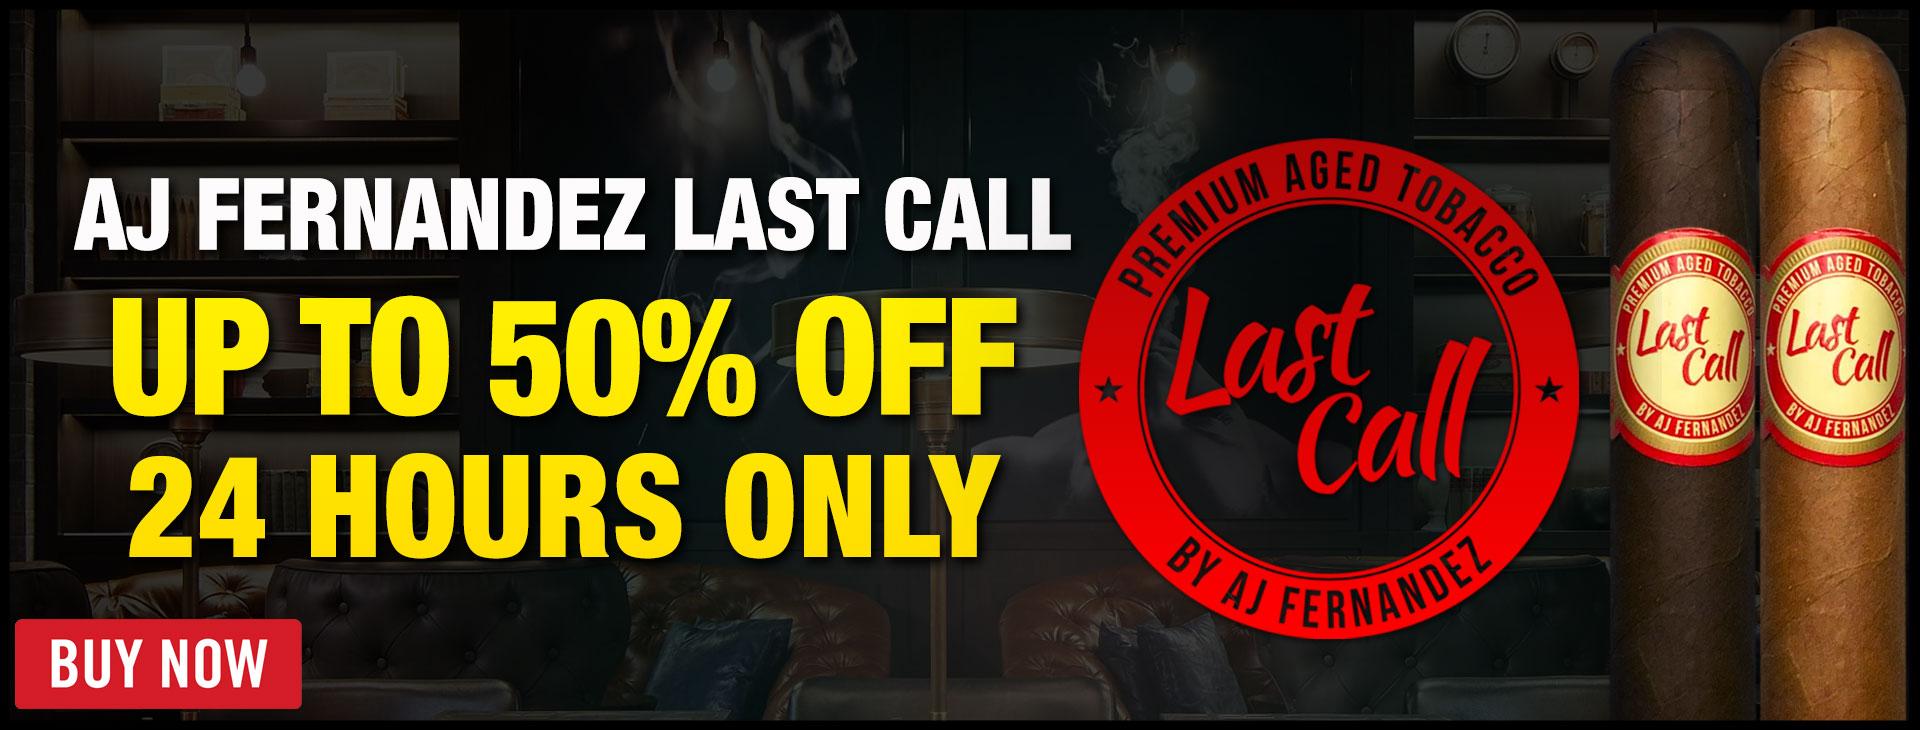 aj-fernandez-last-call-2021-banner.jpg